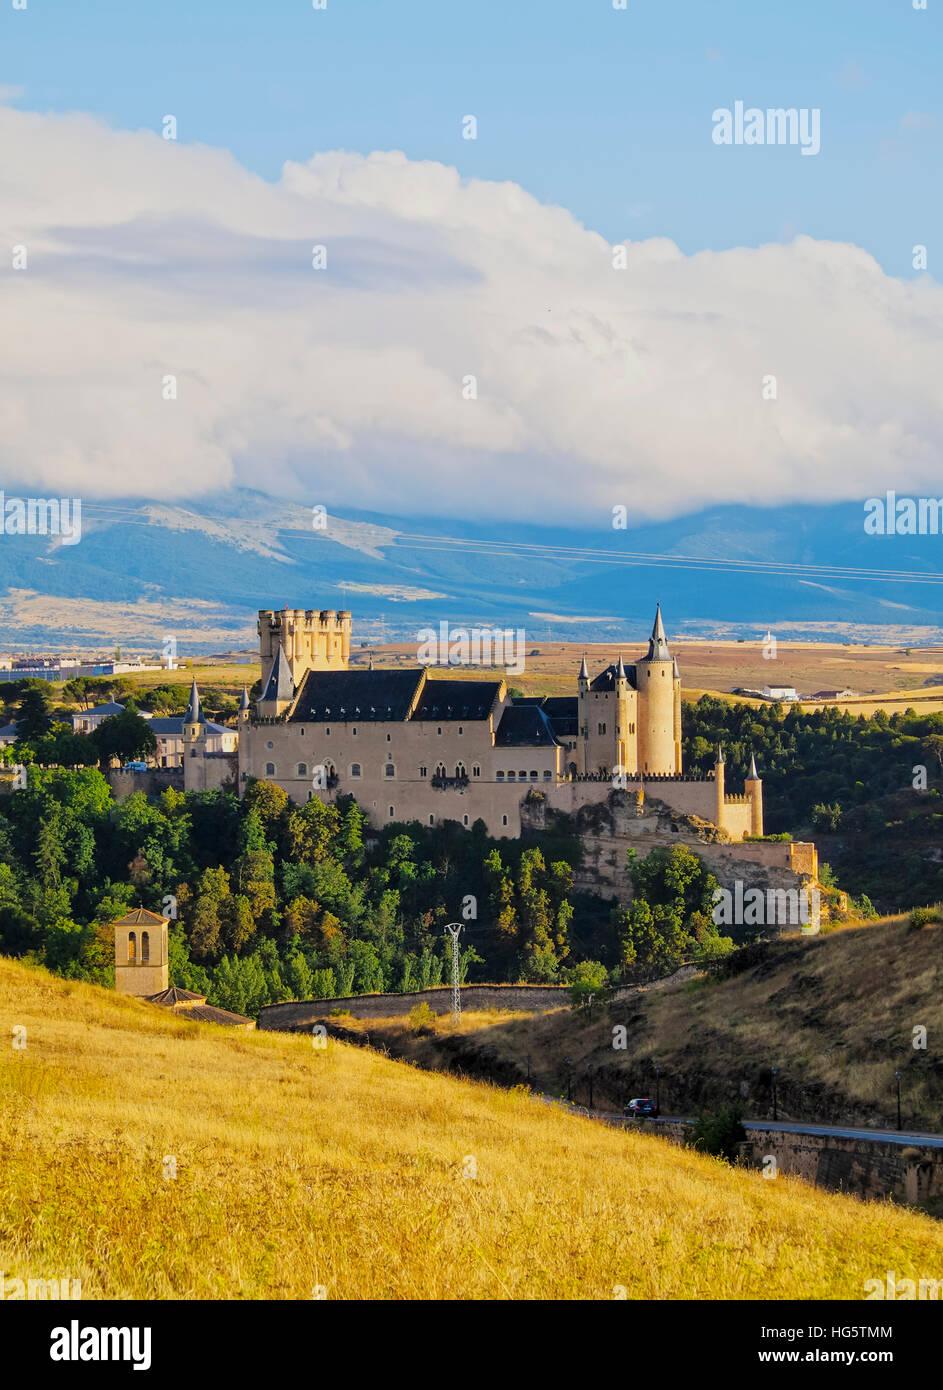 Spain, Castile and Leon, Segovia, View of the Alcazar. - Stock Image